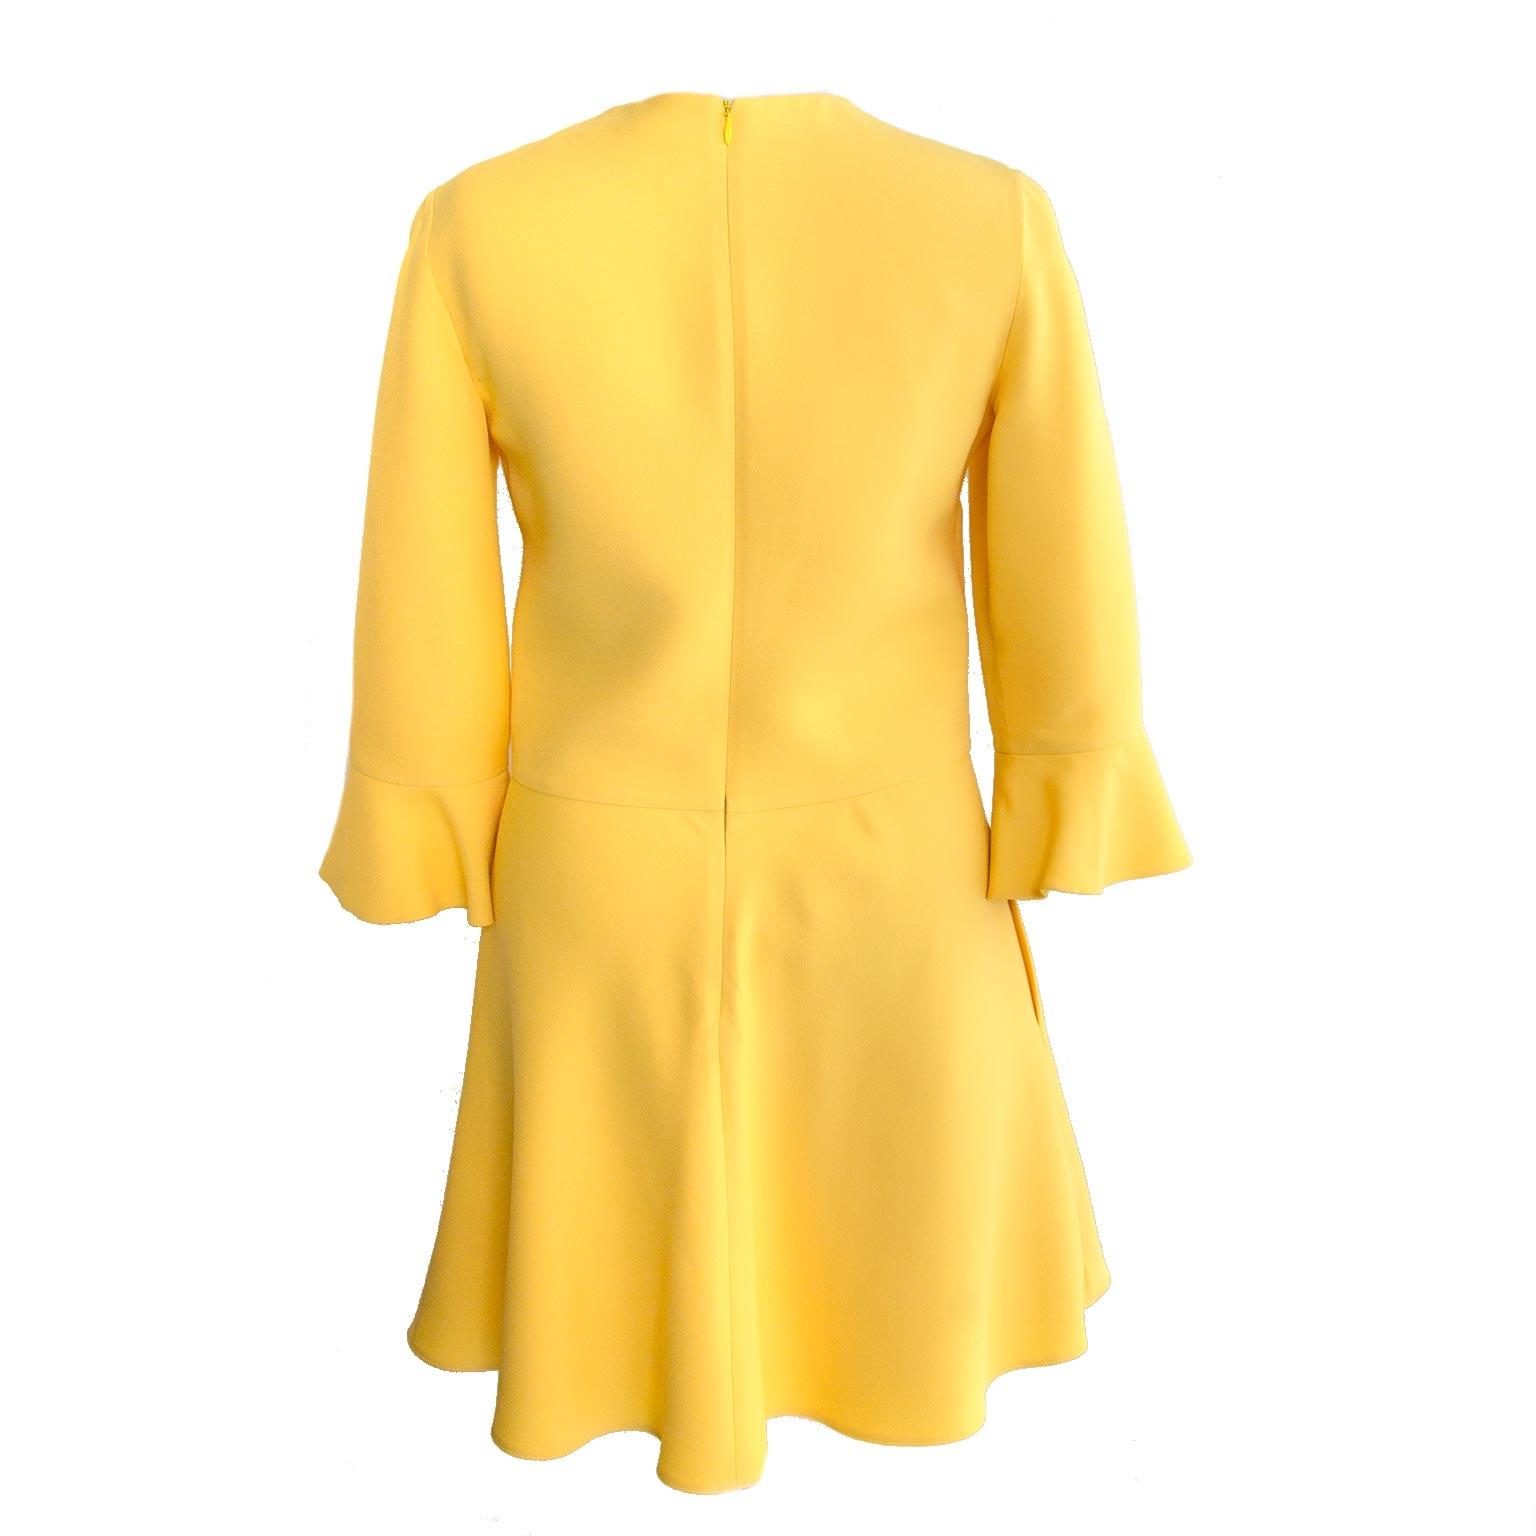 buy authentic valentino yellow dress at labellov vintage fashion webshop belgium